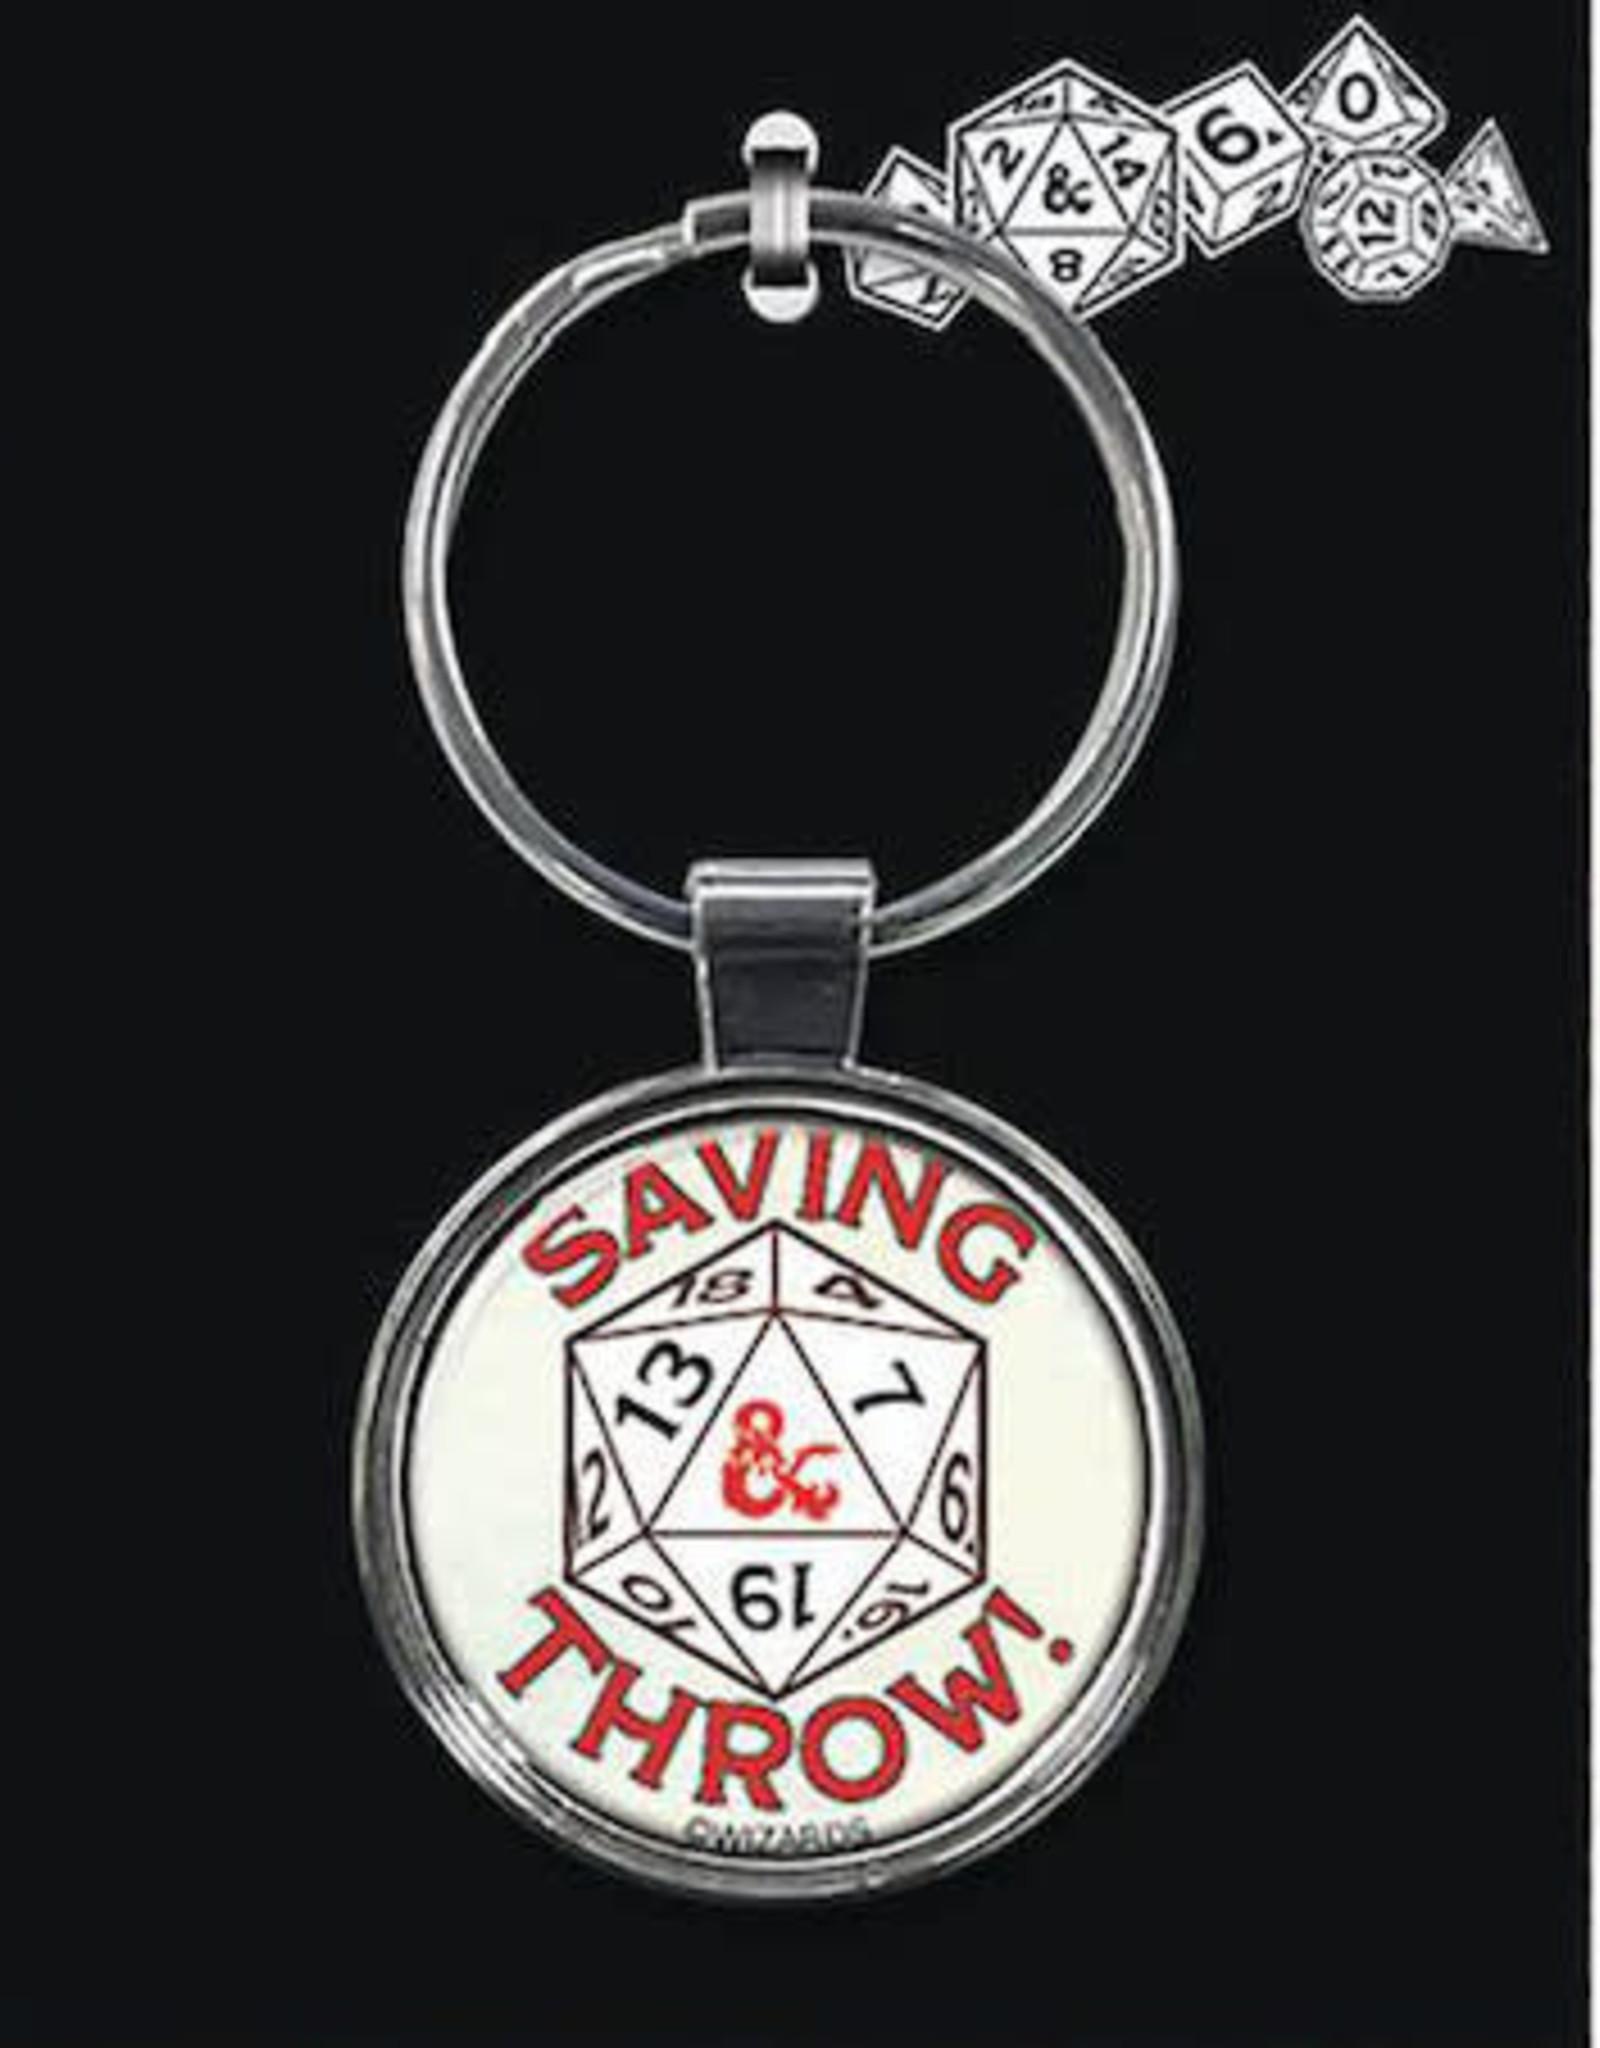 Ata Boy Dungeons & Dragons Keychain: Saving Throw